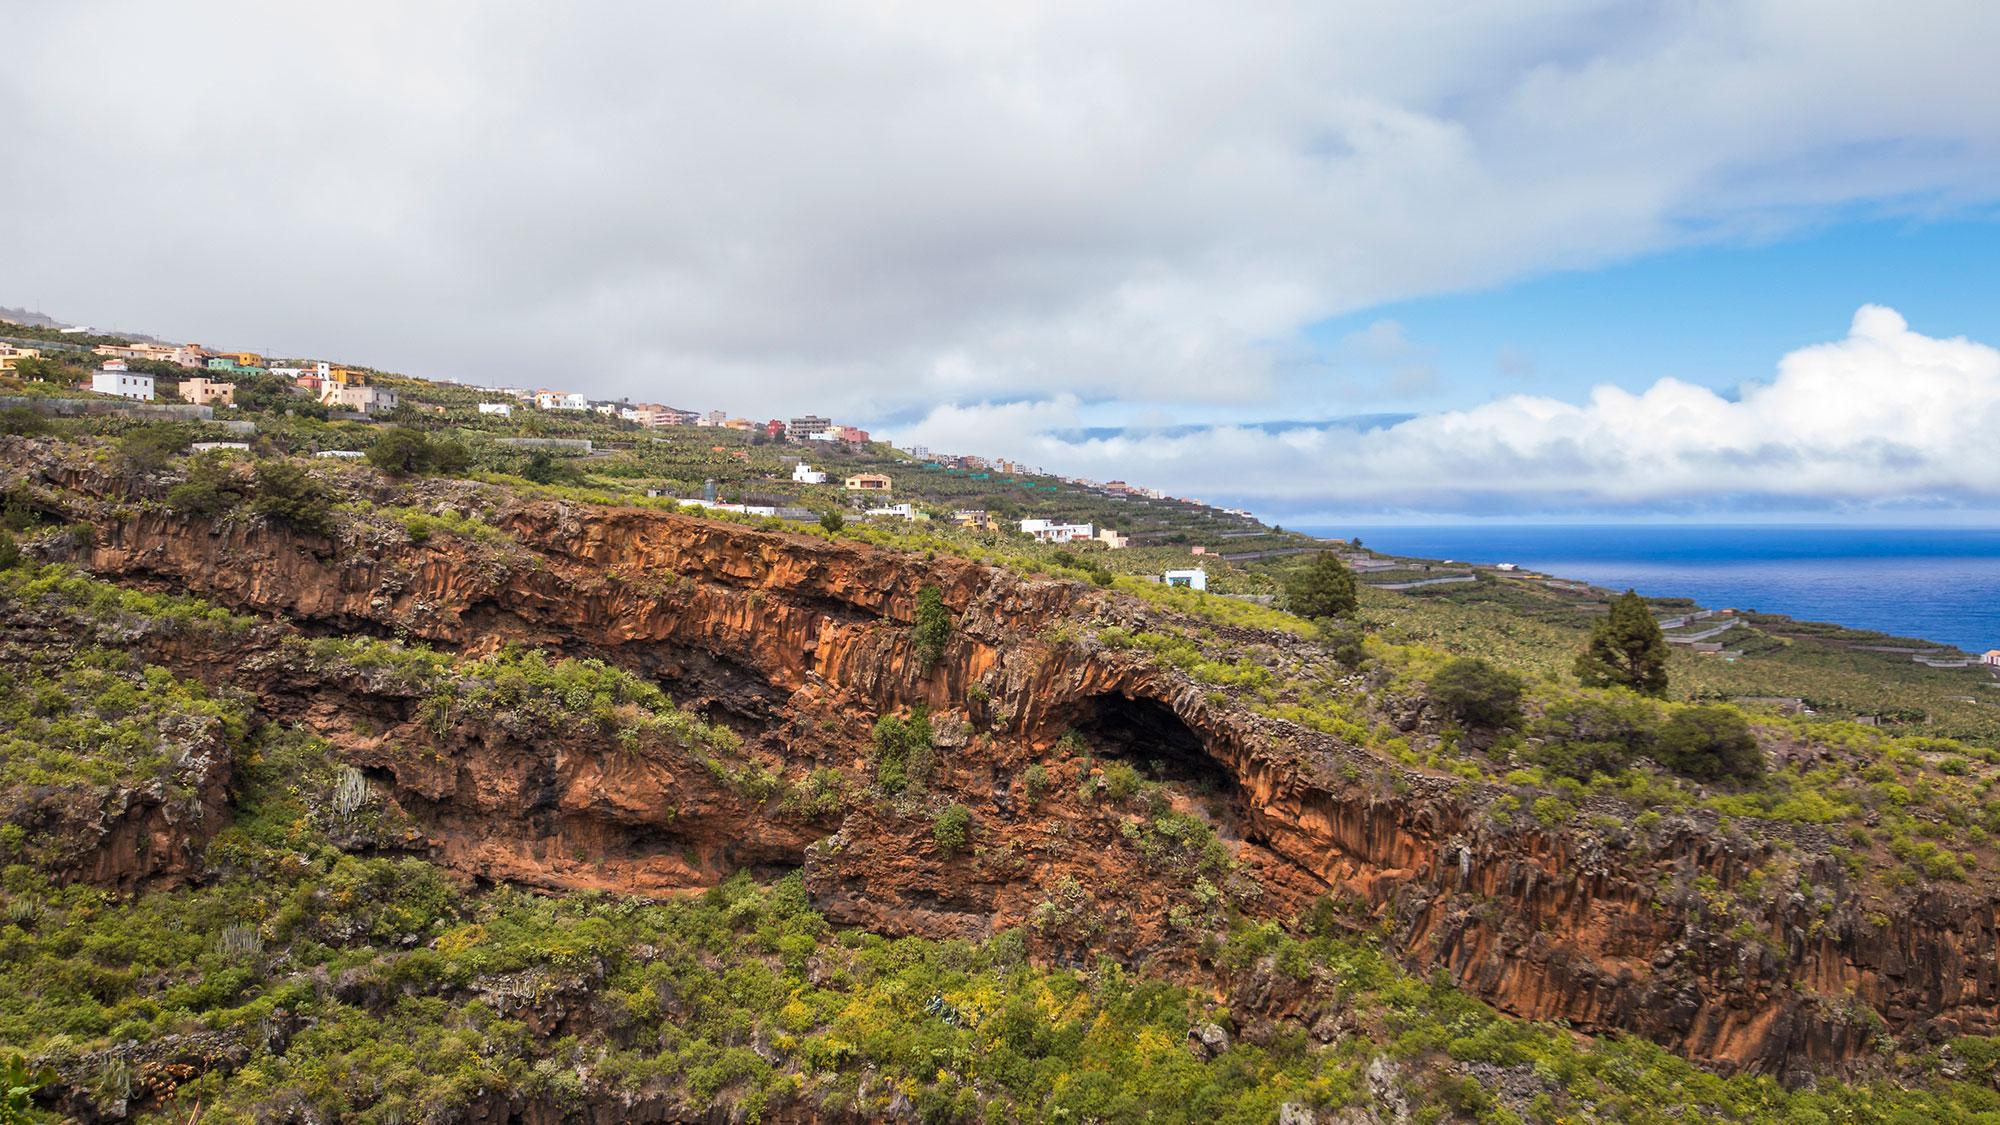 Naturaleza mágica, paisajes increibles, Islas Canarias - España- imagen #4